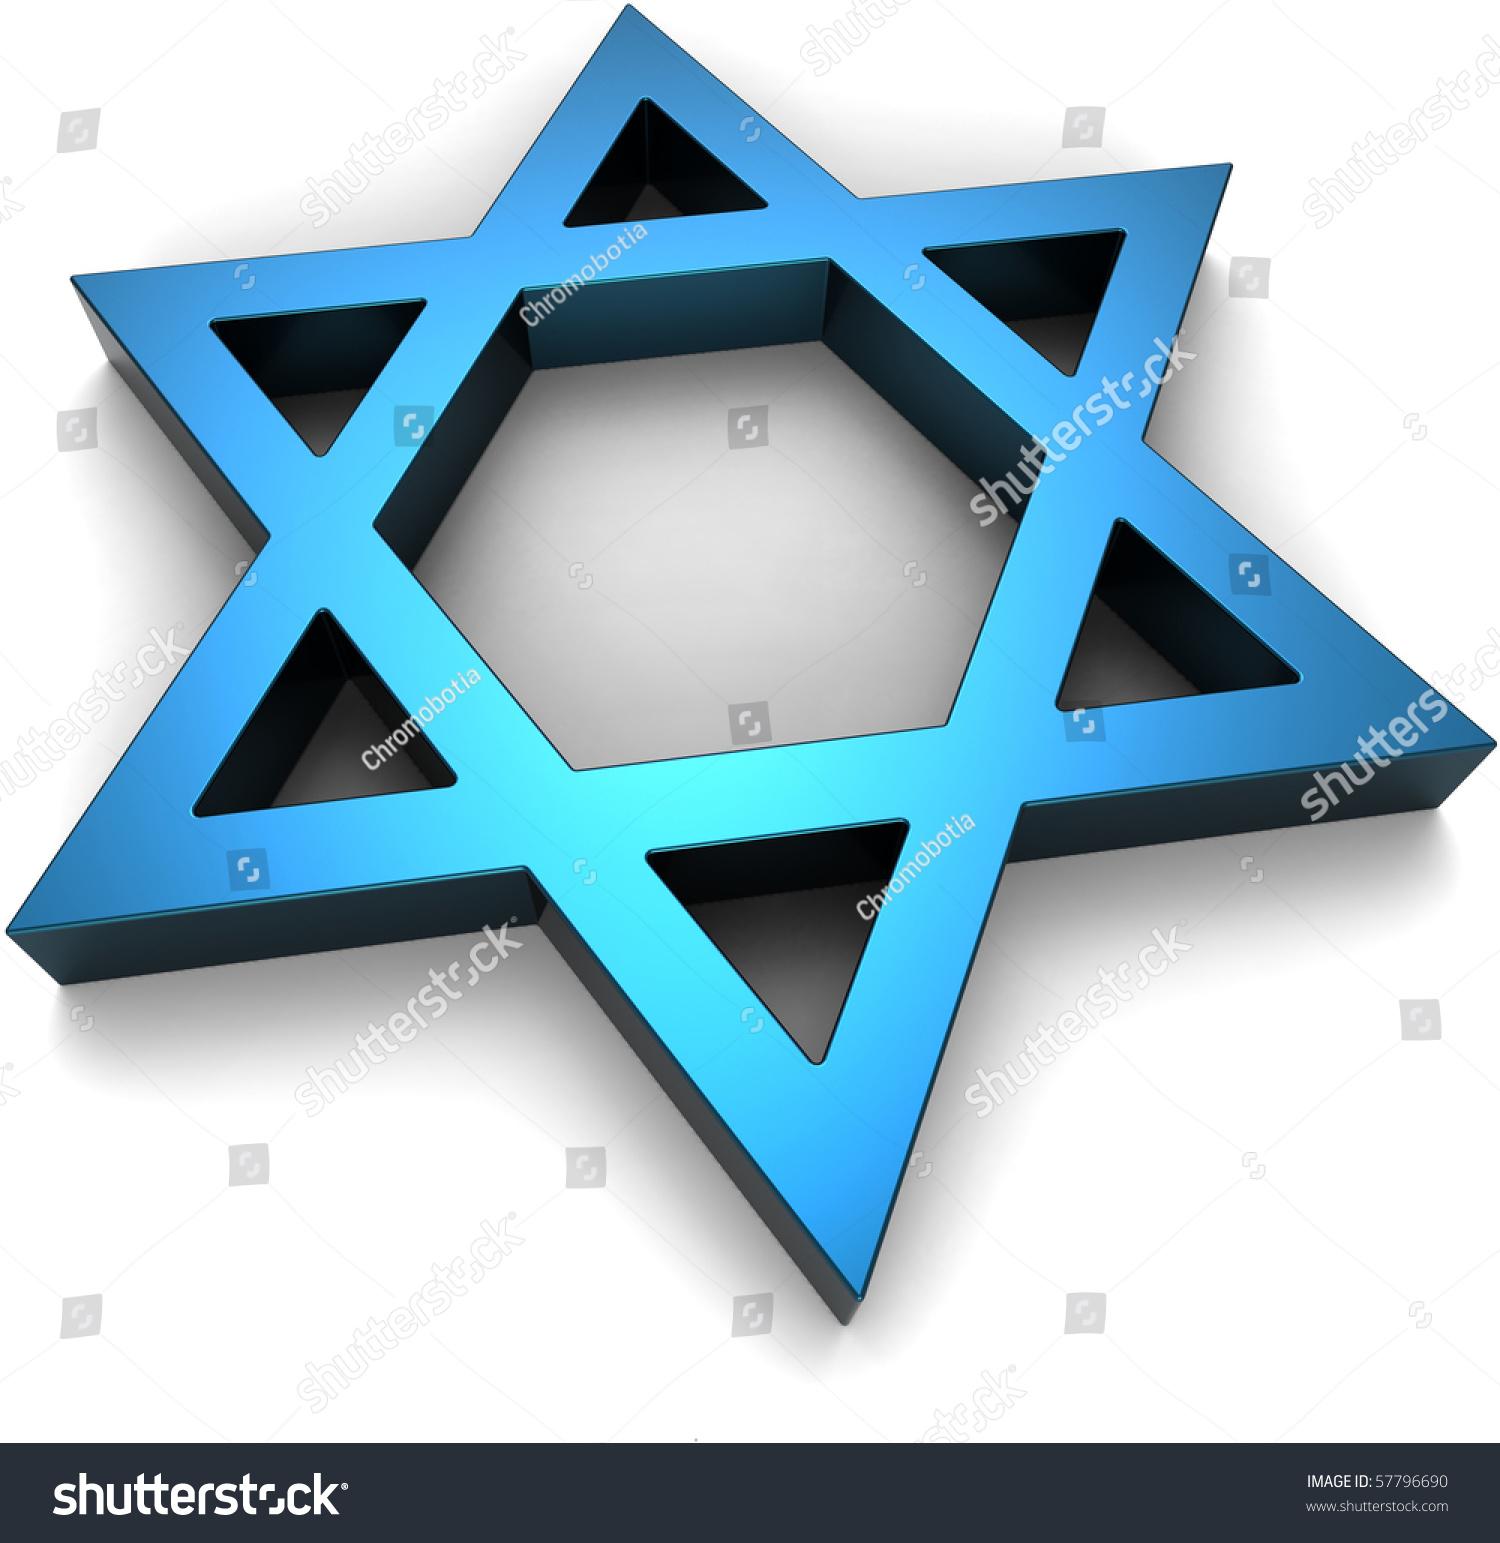 Magen David Jewish Symbol Stock Illustration 57796690 - Shutterstock